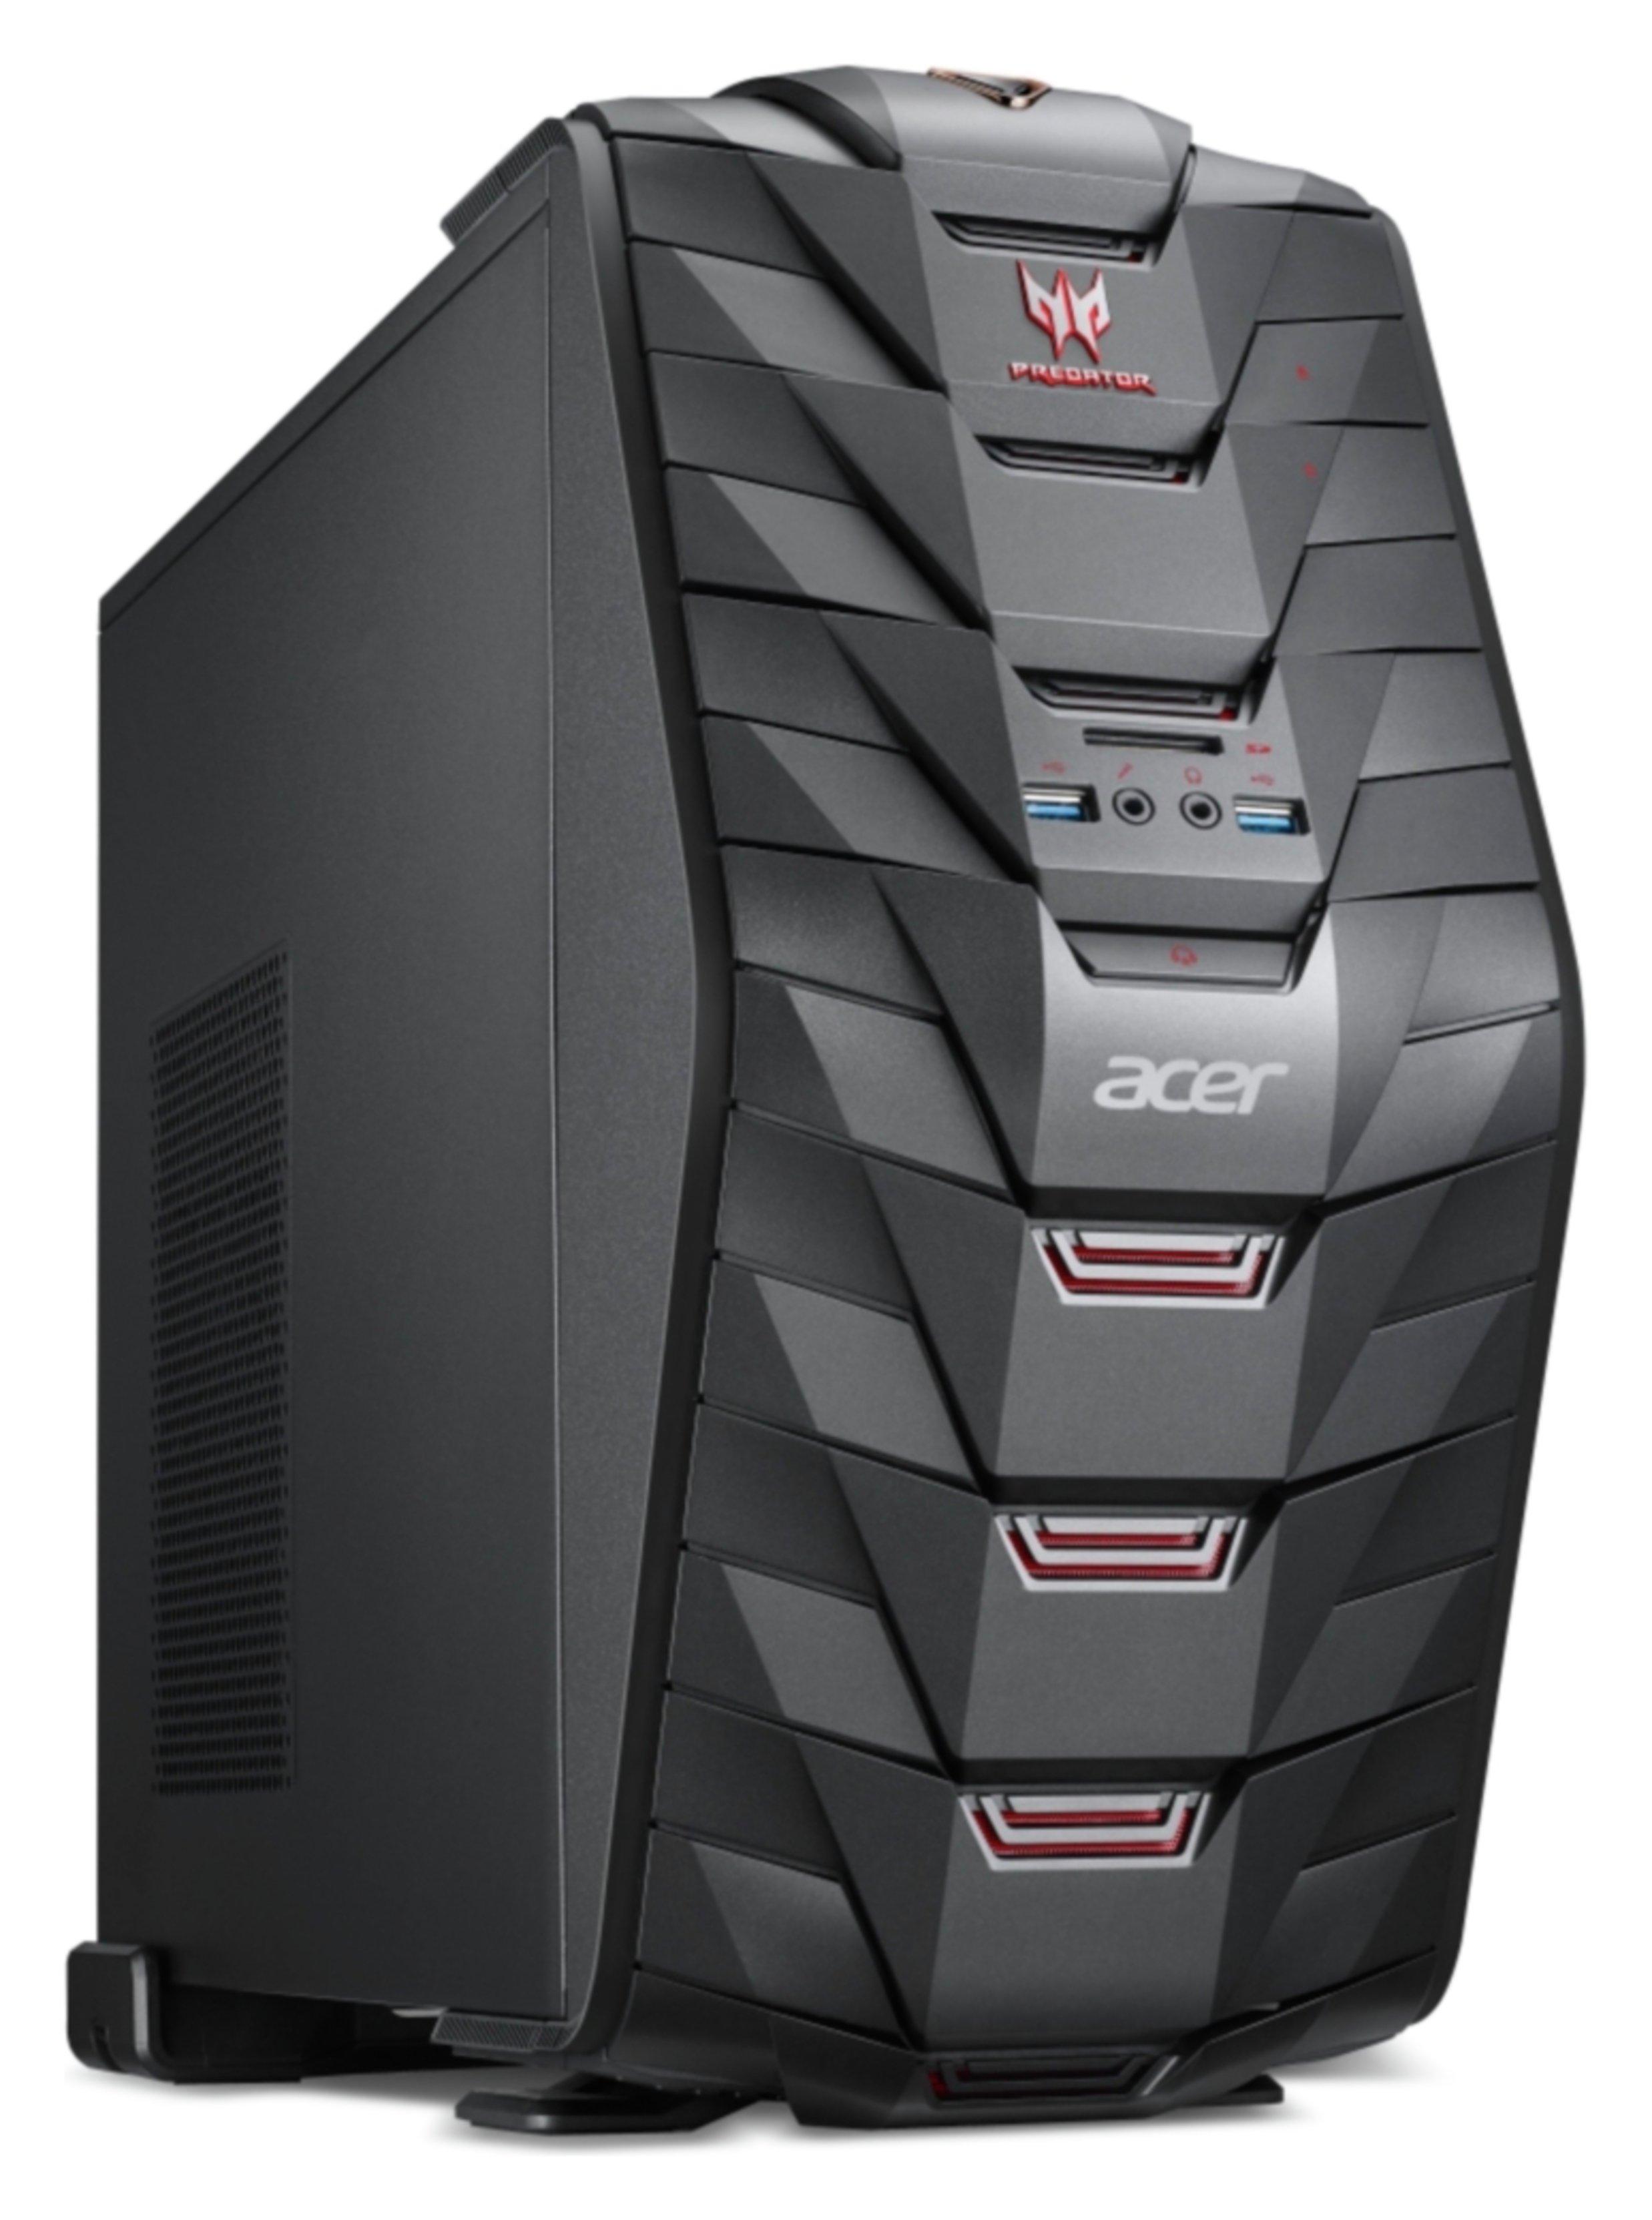 Image of Acer Predator i5 8GB 1TB 128GB GTX1060 Gaming PC - Black